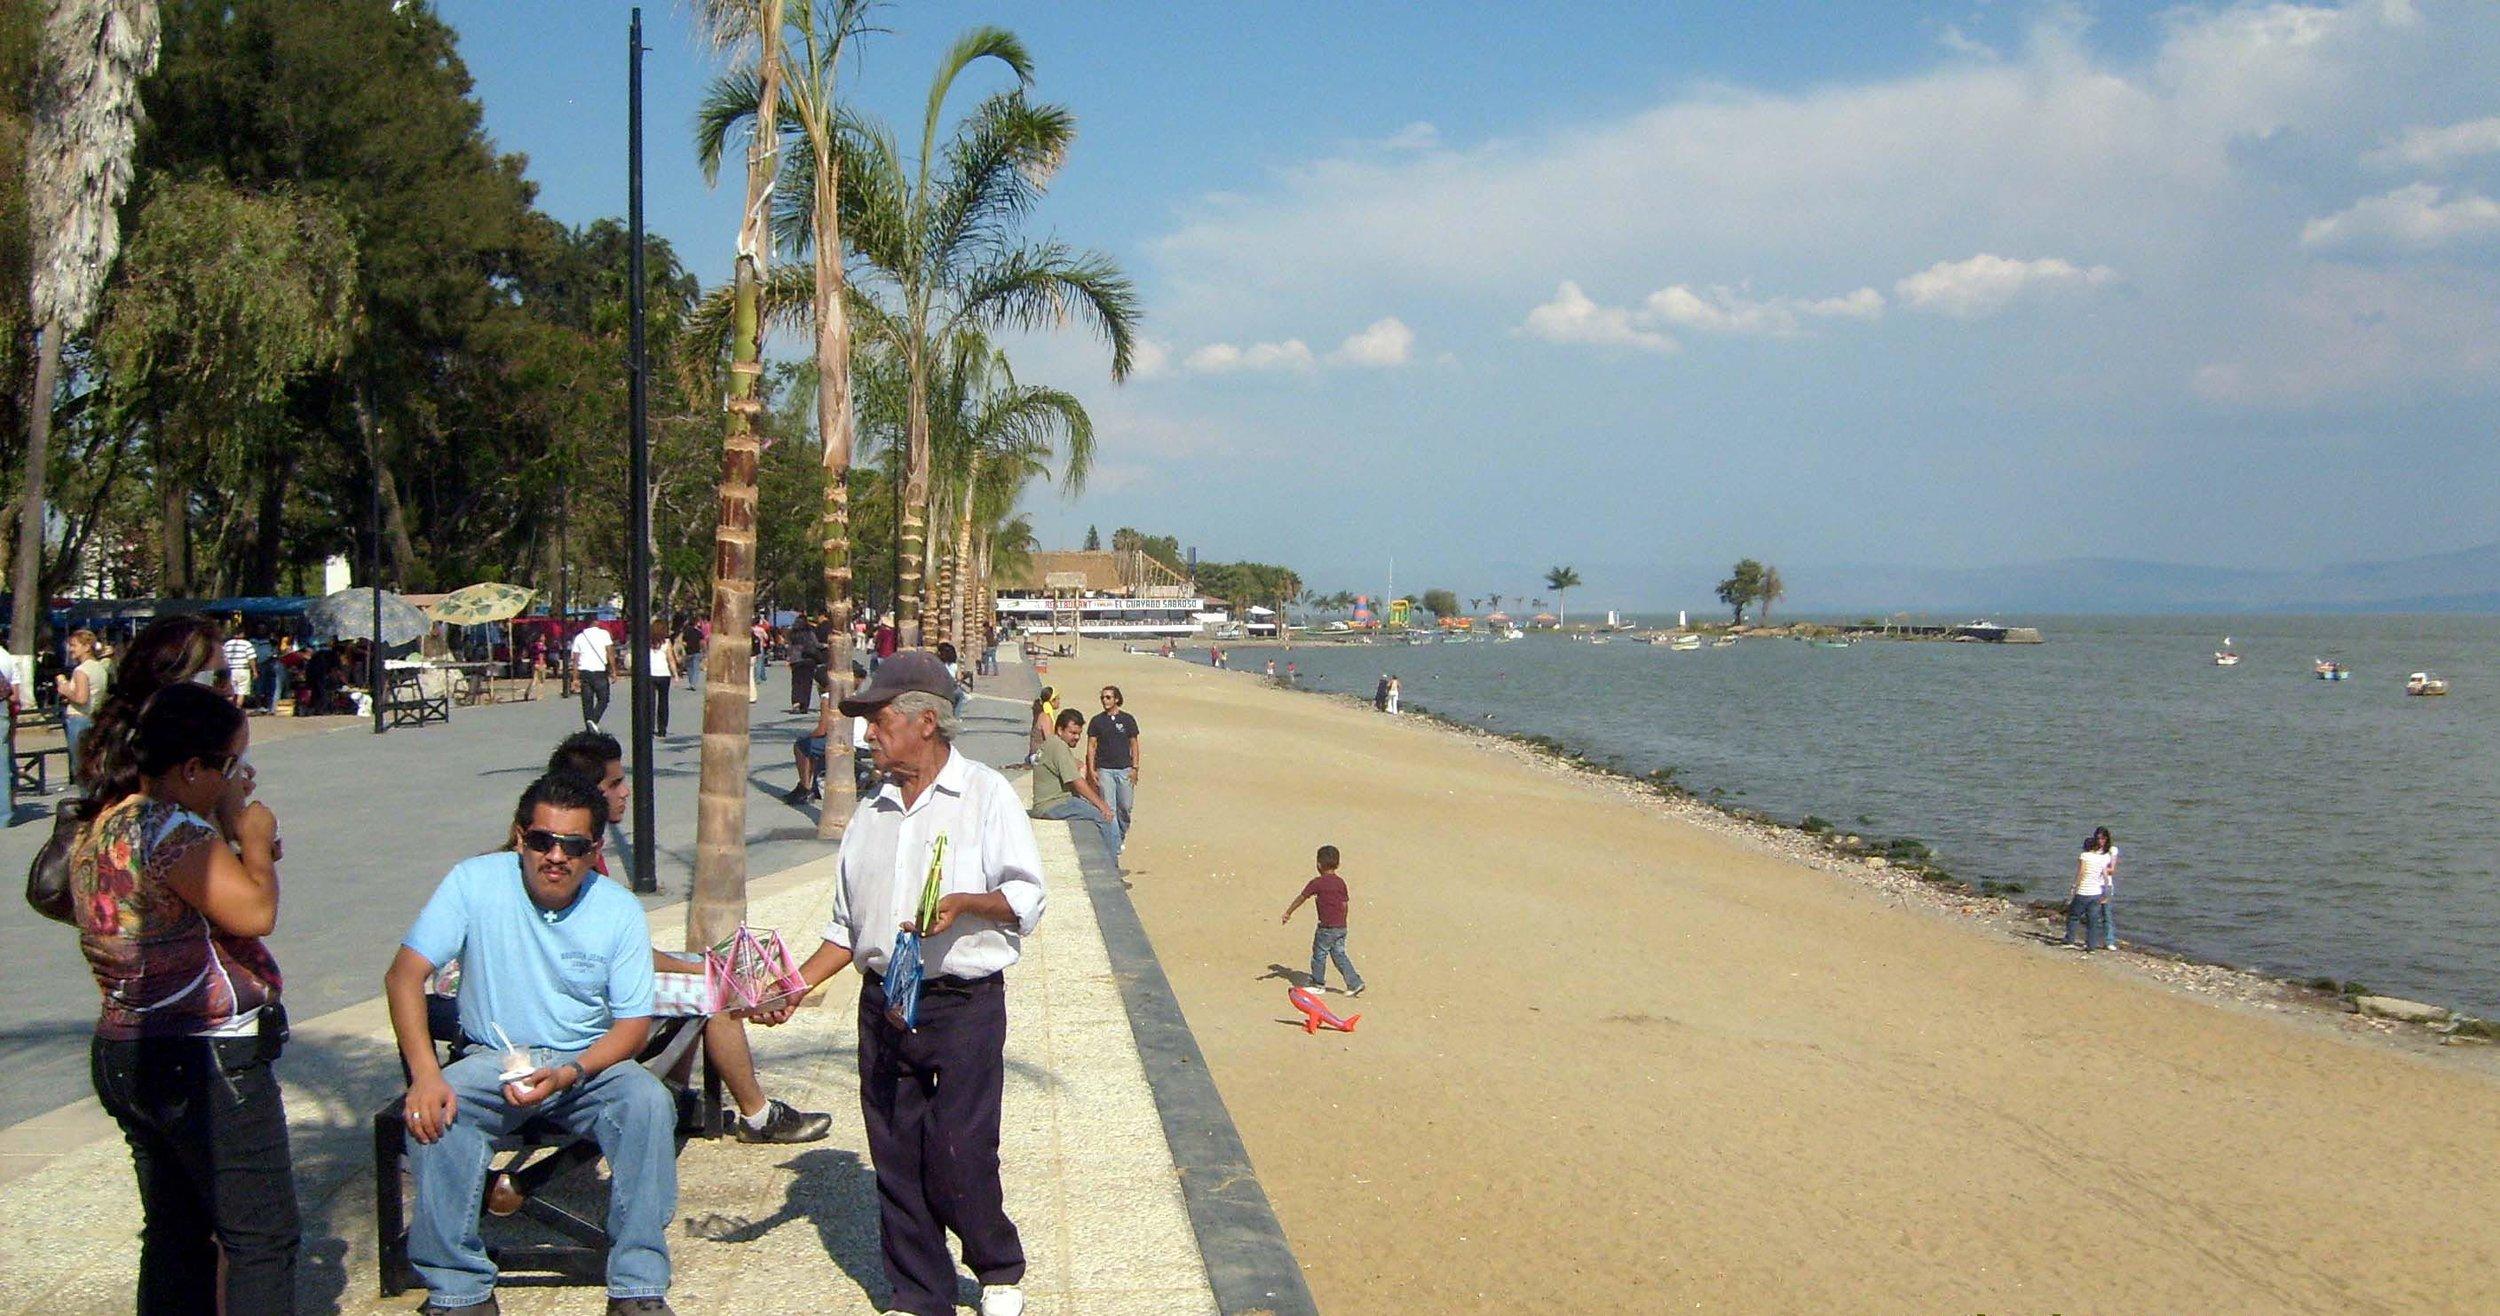 Lakeside promenade and beach — the Ajijic boardwalk has something for everyone